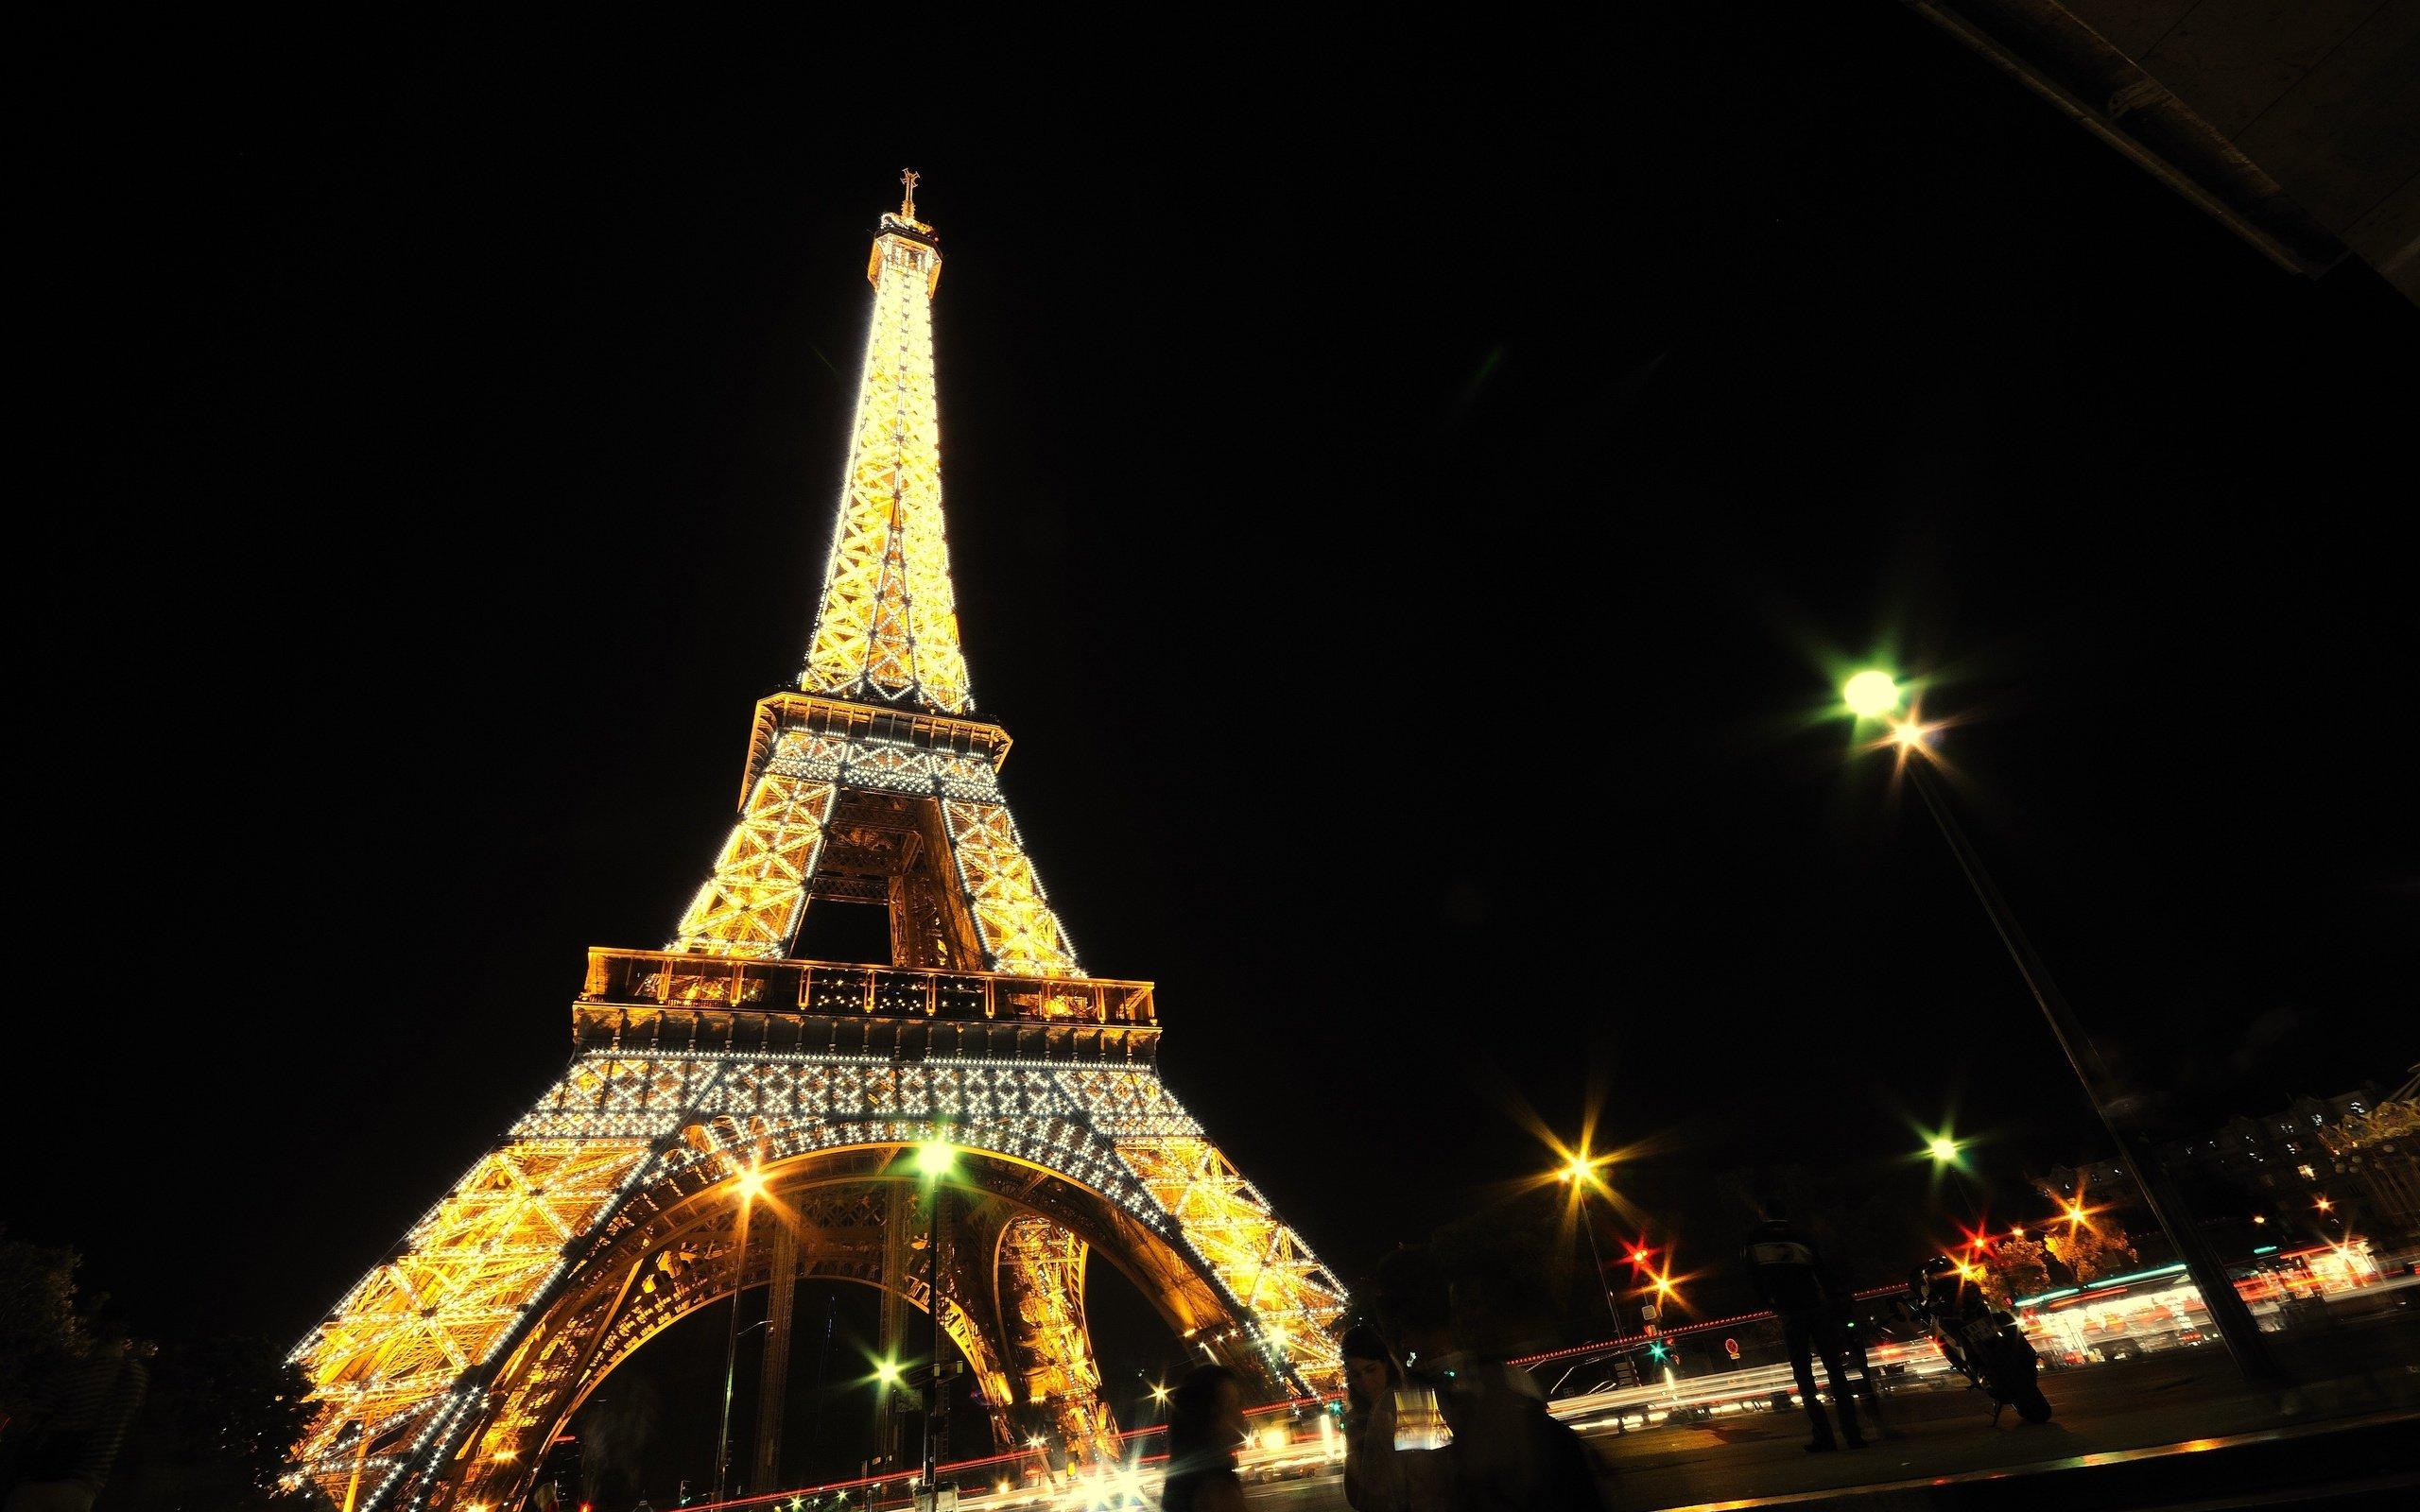 Eiffel Tower Paris night wallpaper background 2560x1600